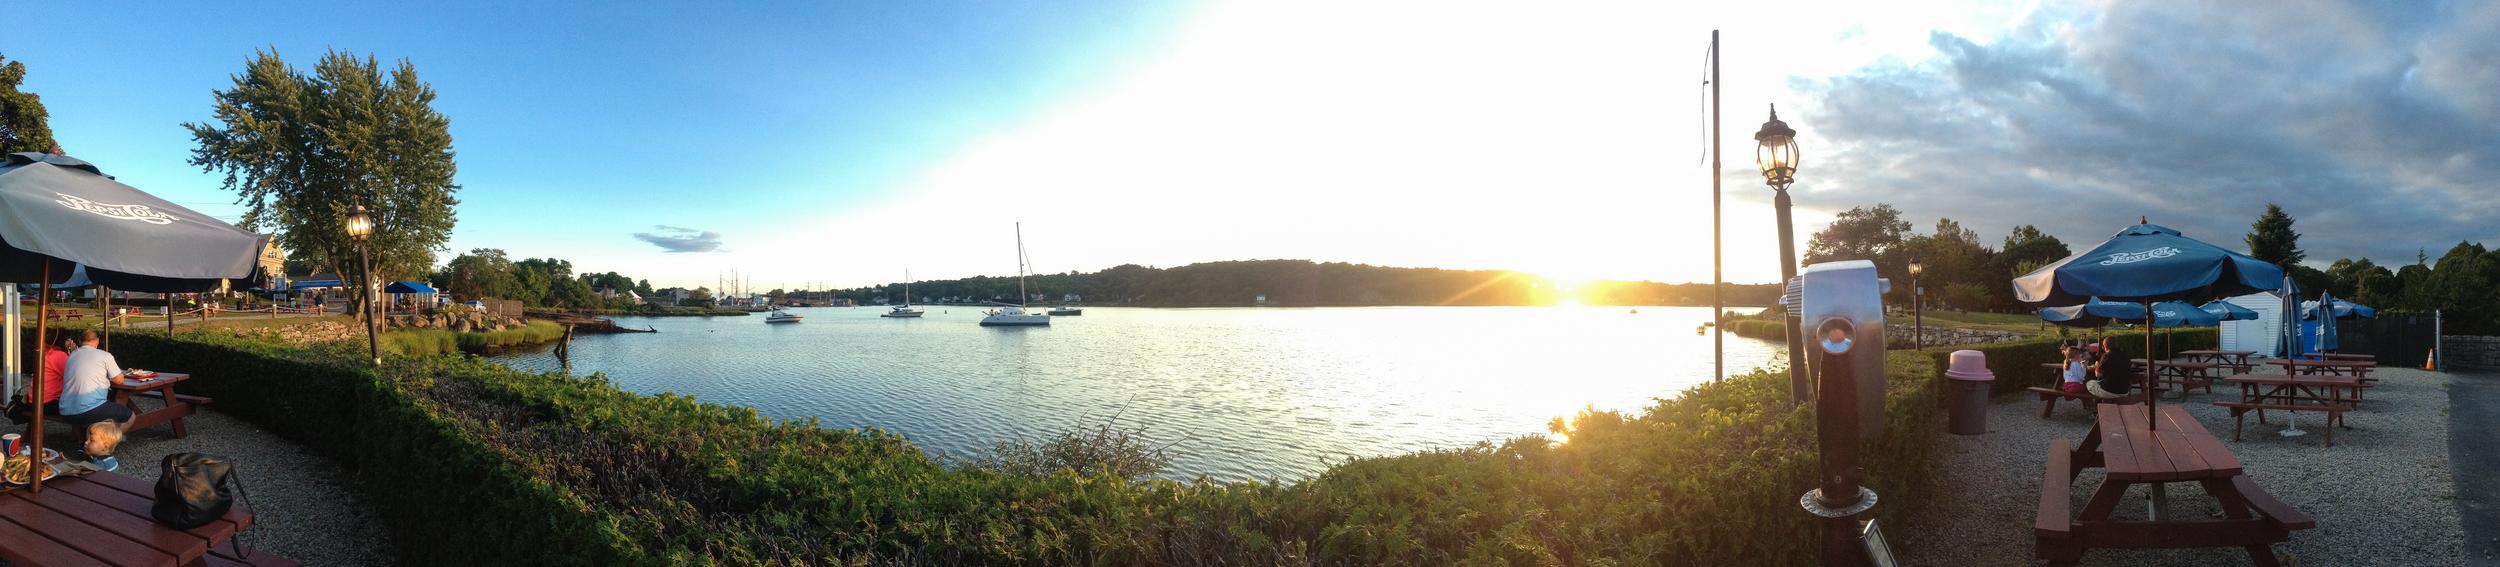 Cape Cod Edits -14.jpg